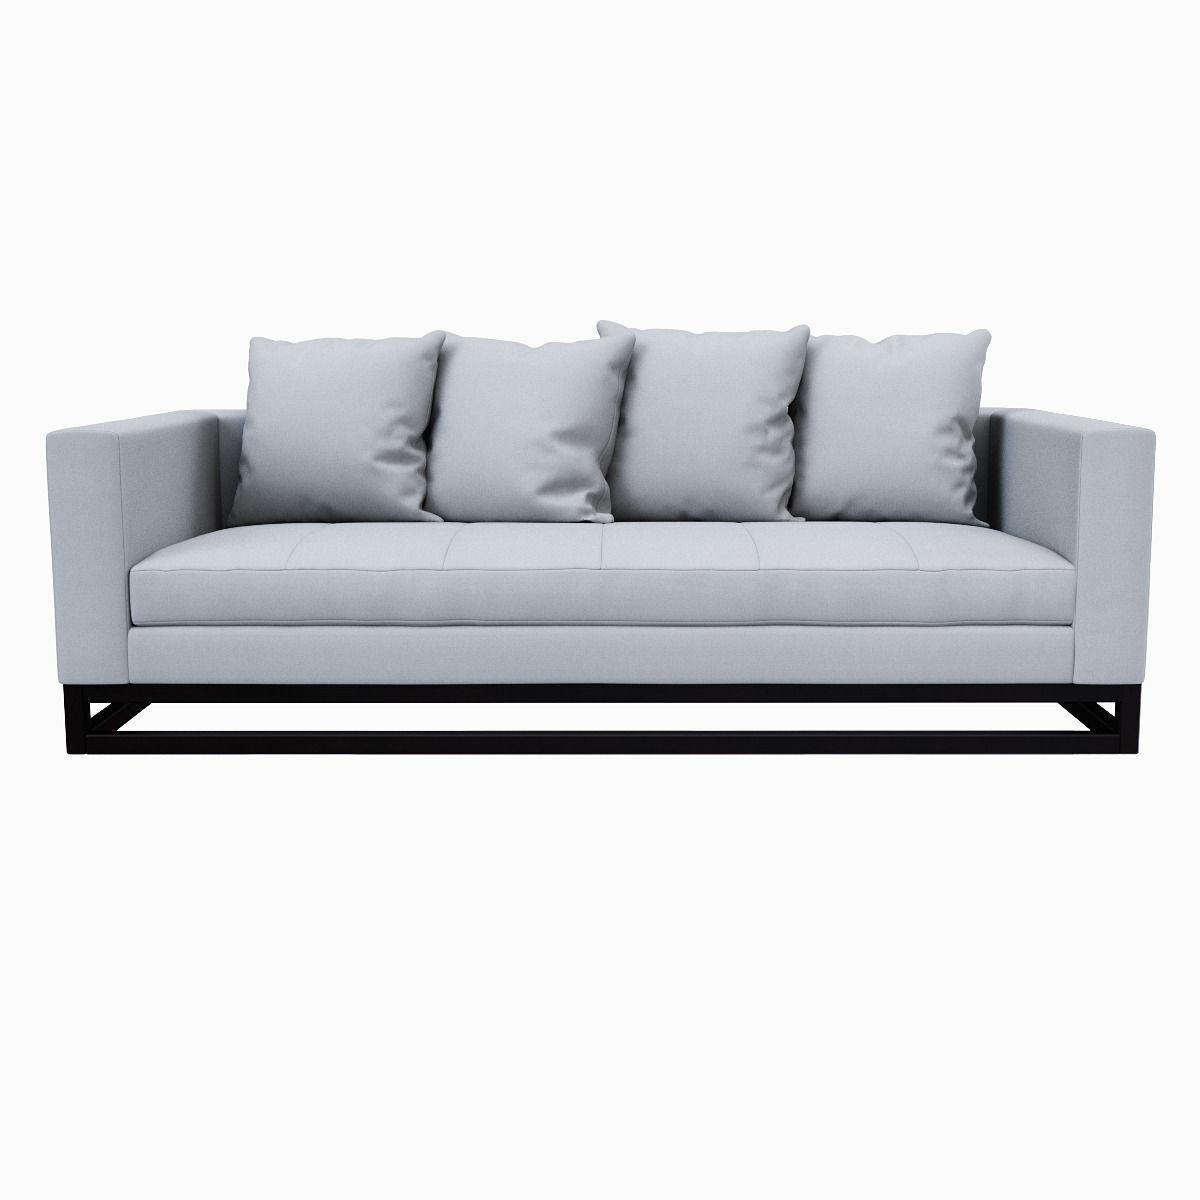 ... West Elm Toss Back Down Filled Sofa 3d Model Max Obj Fbx Mtl 2 ...